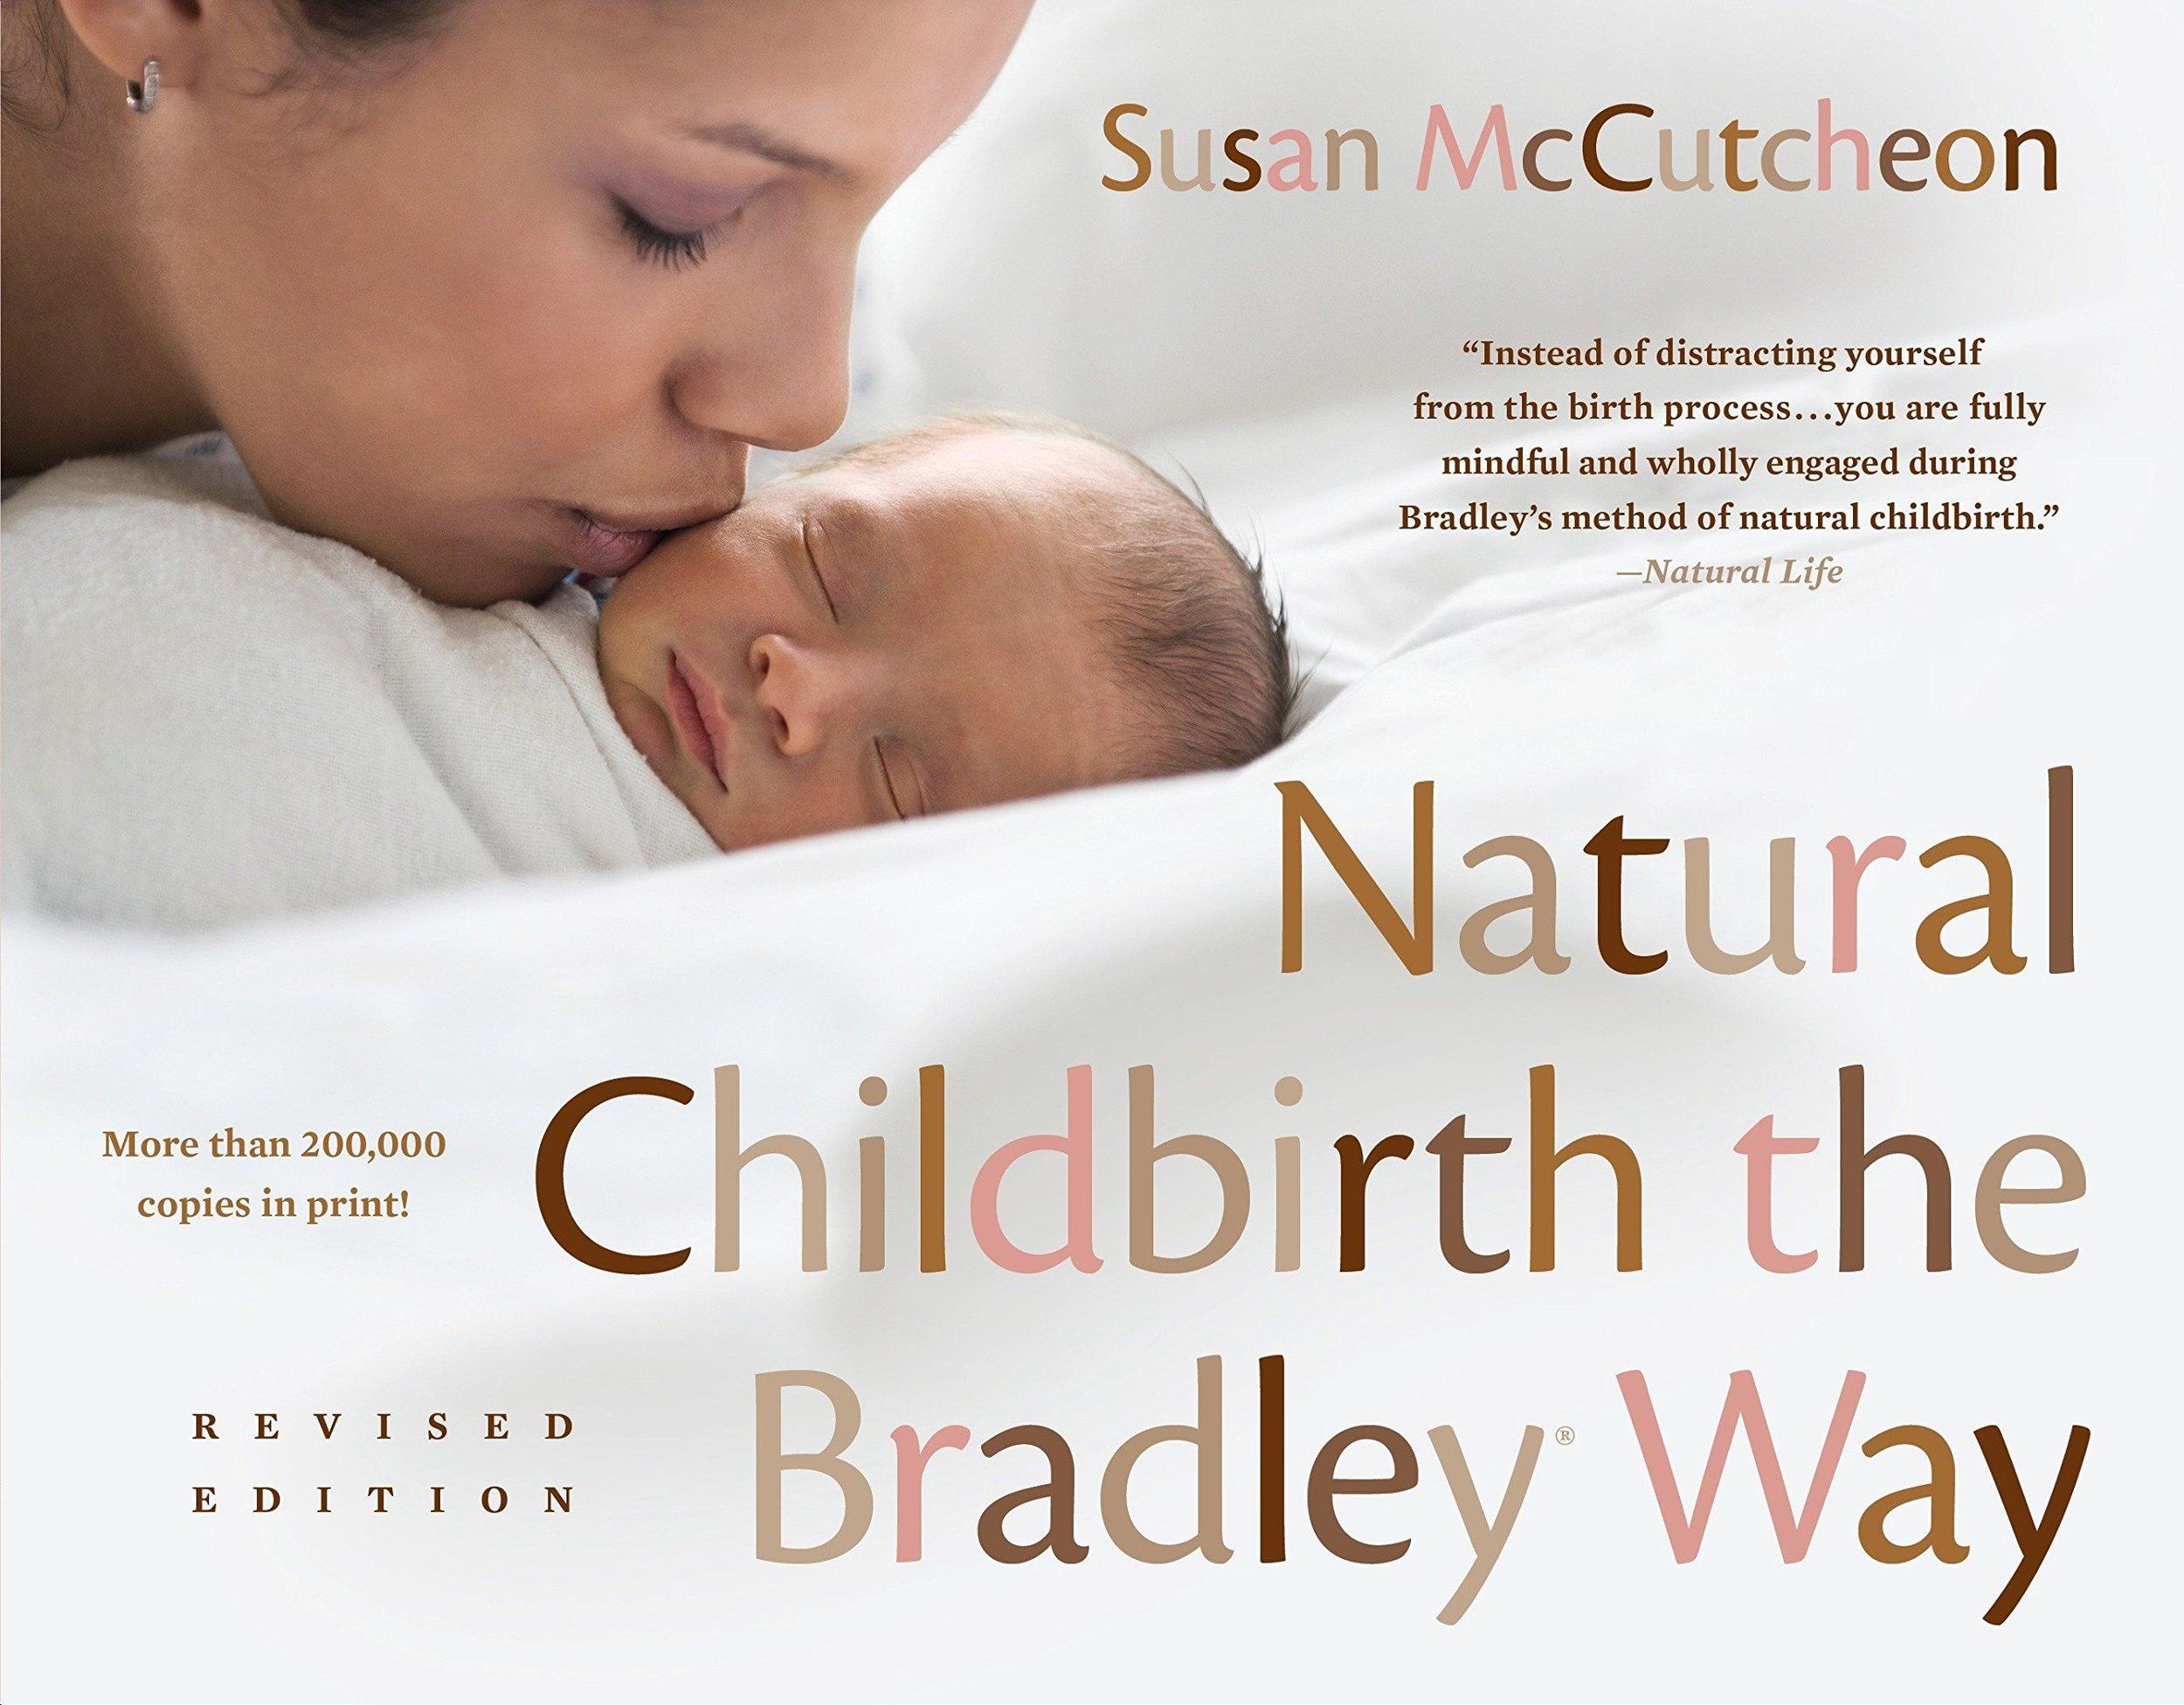 McCutcheon - NATURAL CHILDBIRTH - US Cover.jpg